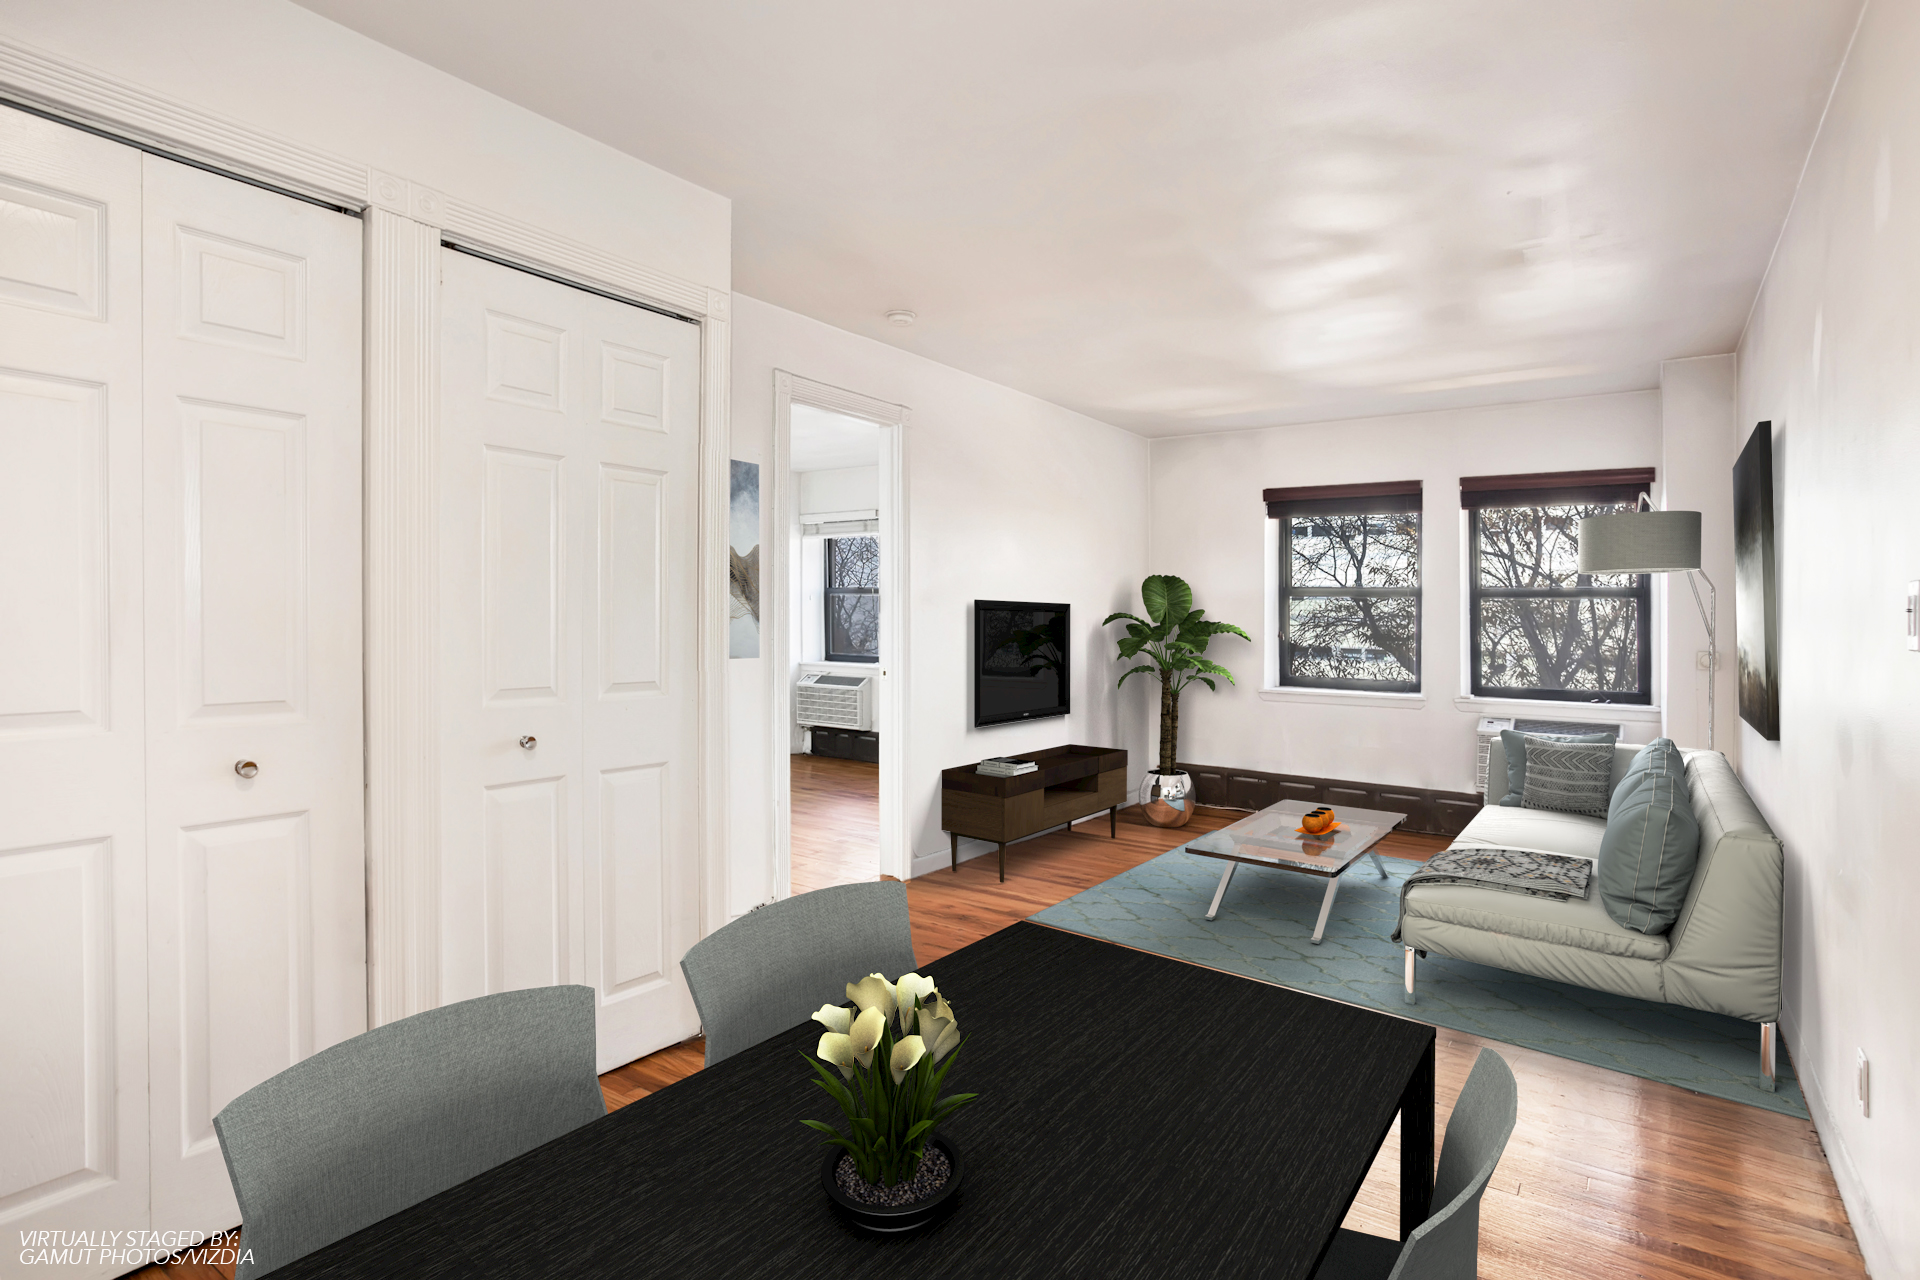 424 West 49th Street, #3A - $698,000